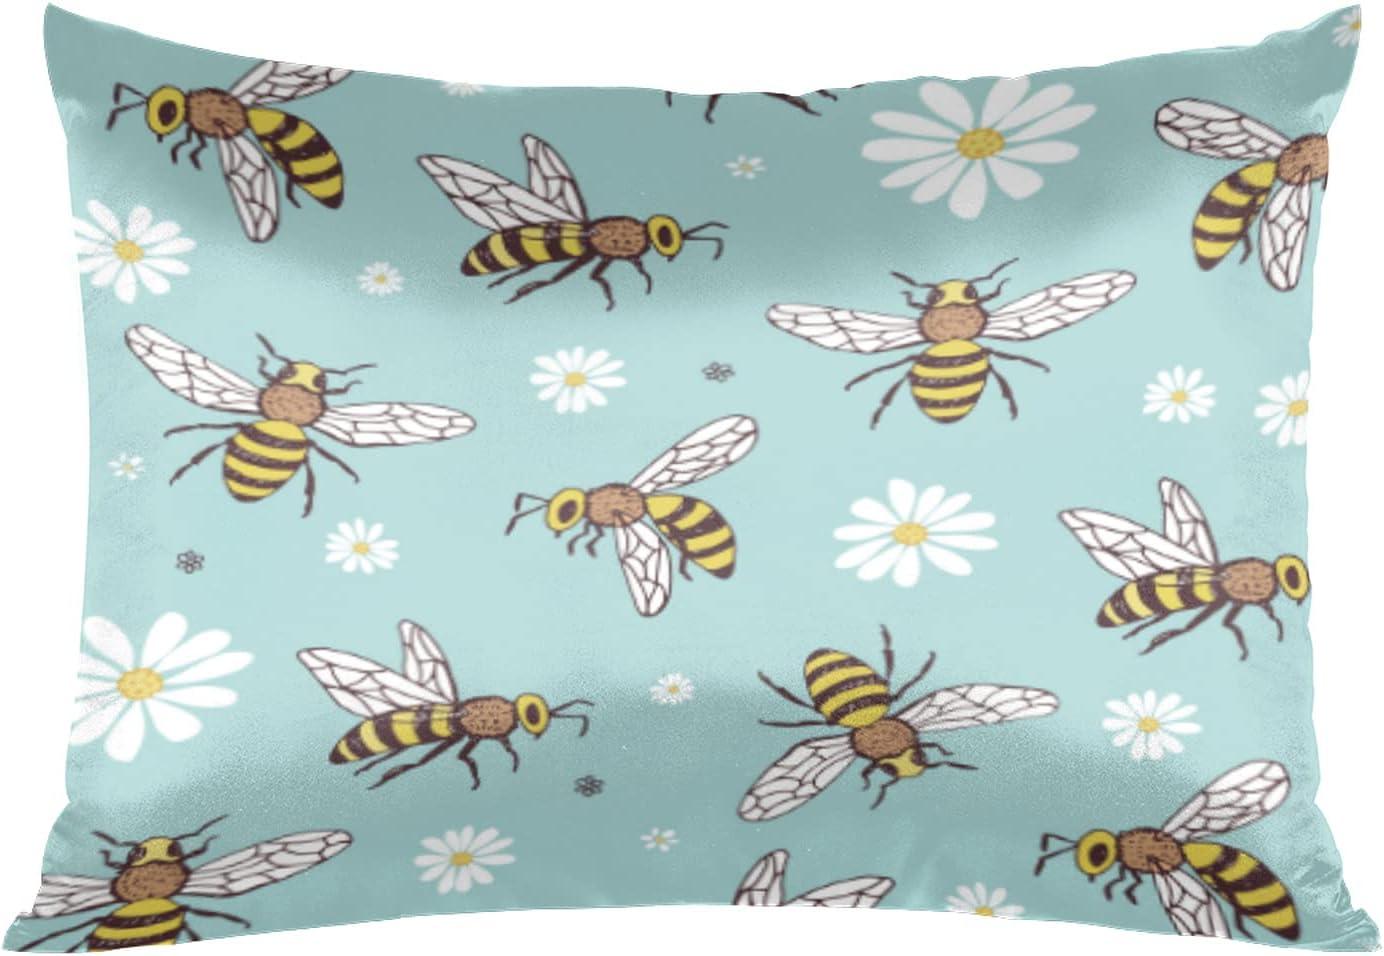 1 year warranty Satin Pillowcase Fashionable for Hair and Skin Flower Bee Silk Pillow Daisy